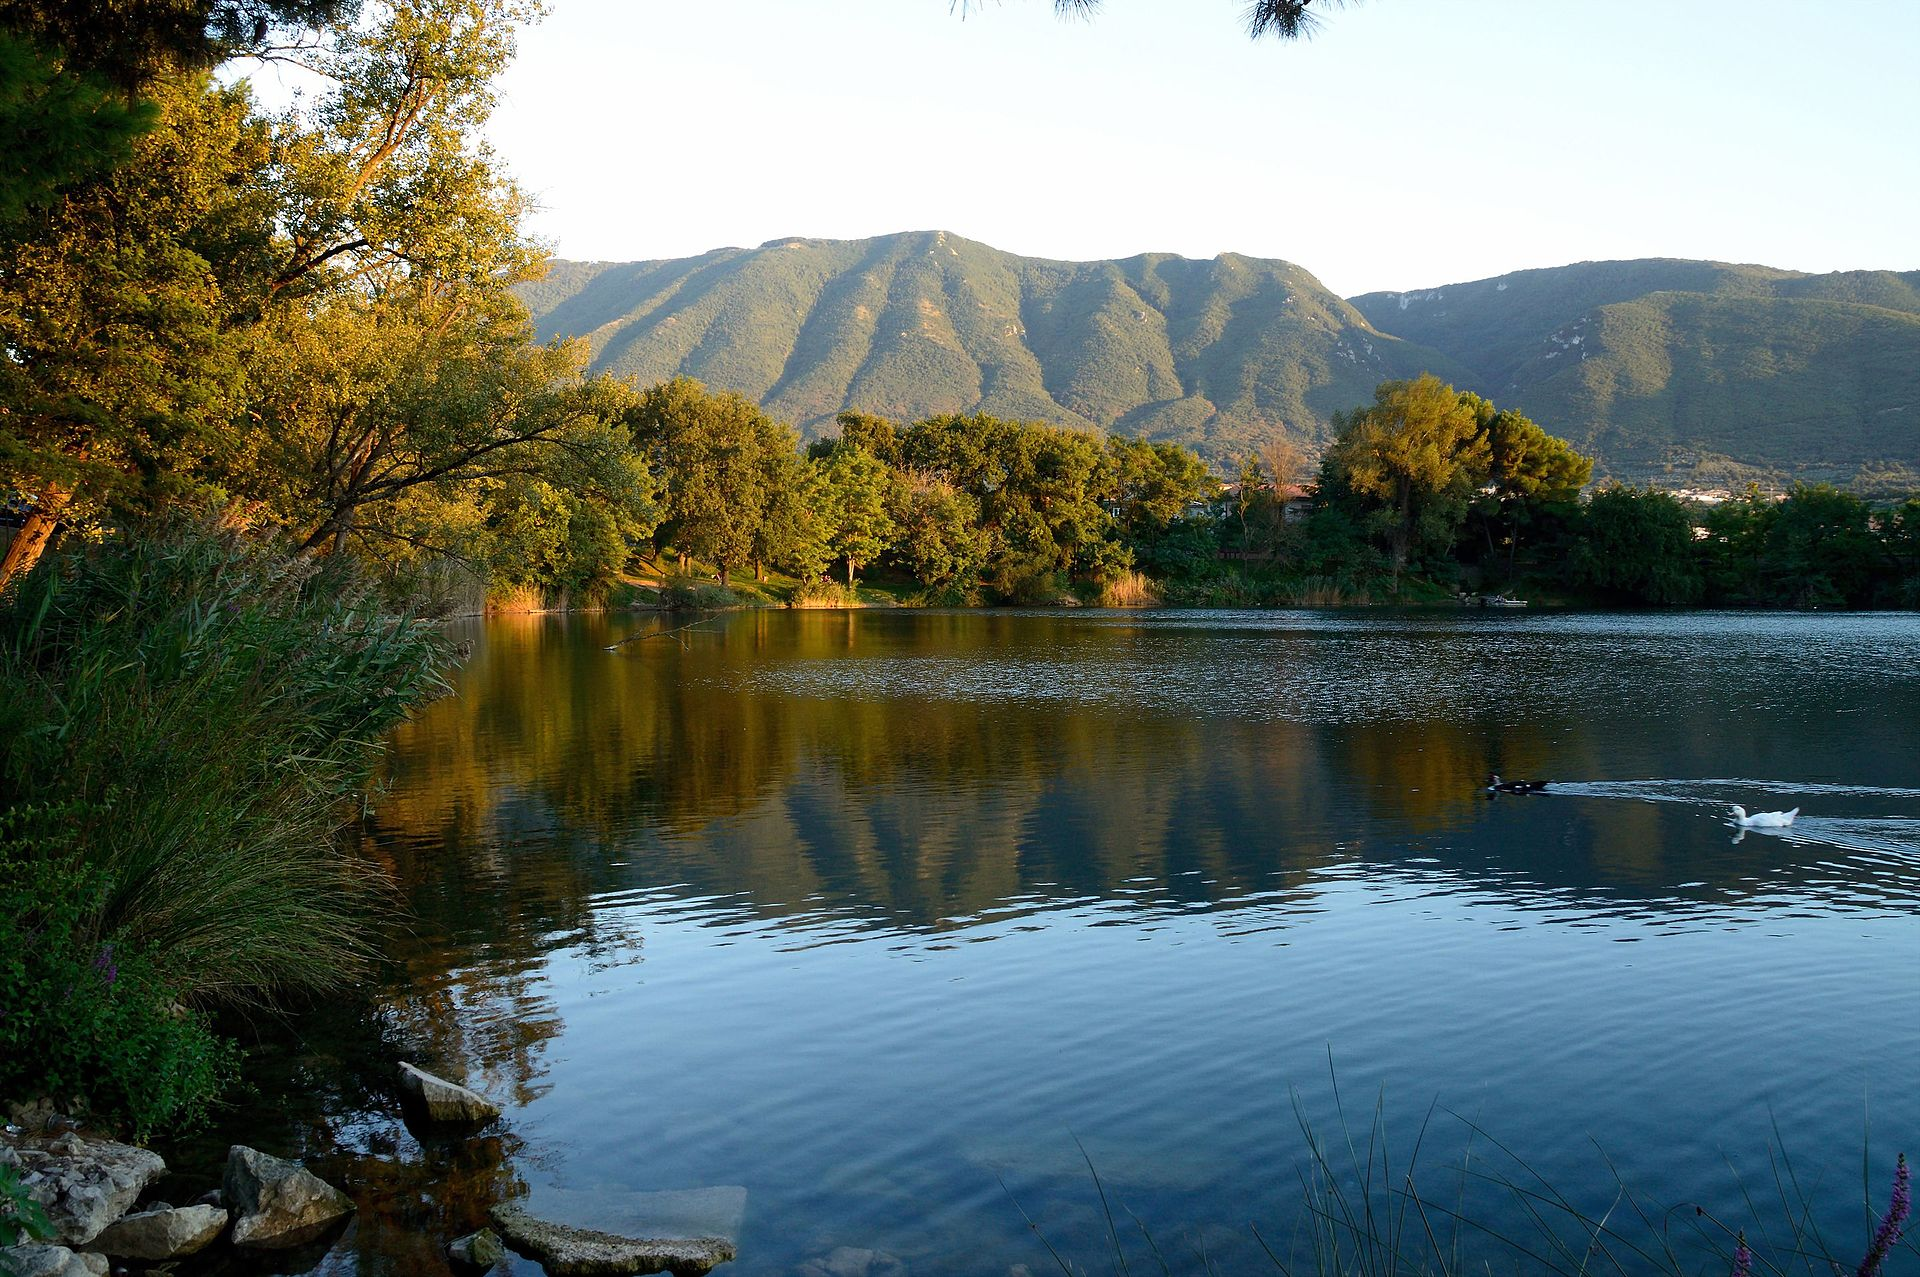 Lago di telese wikipedia for Lago n